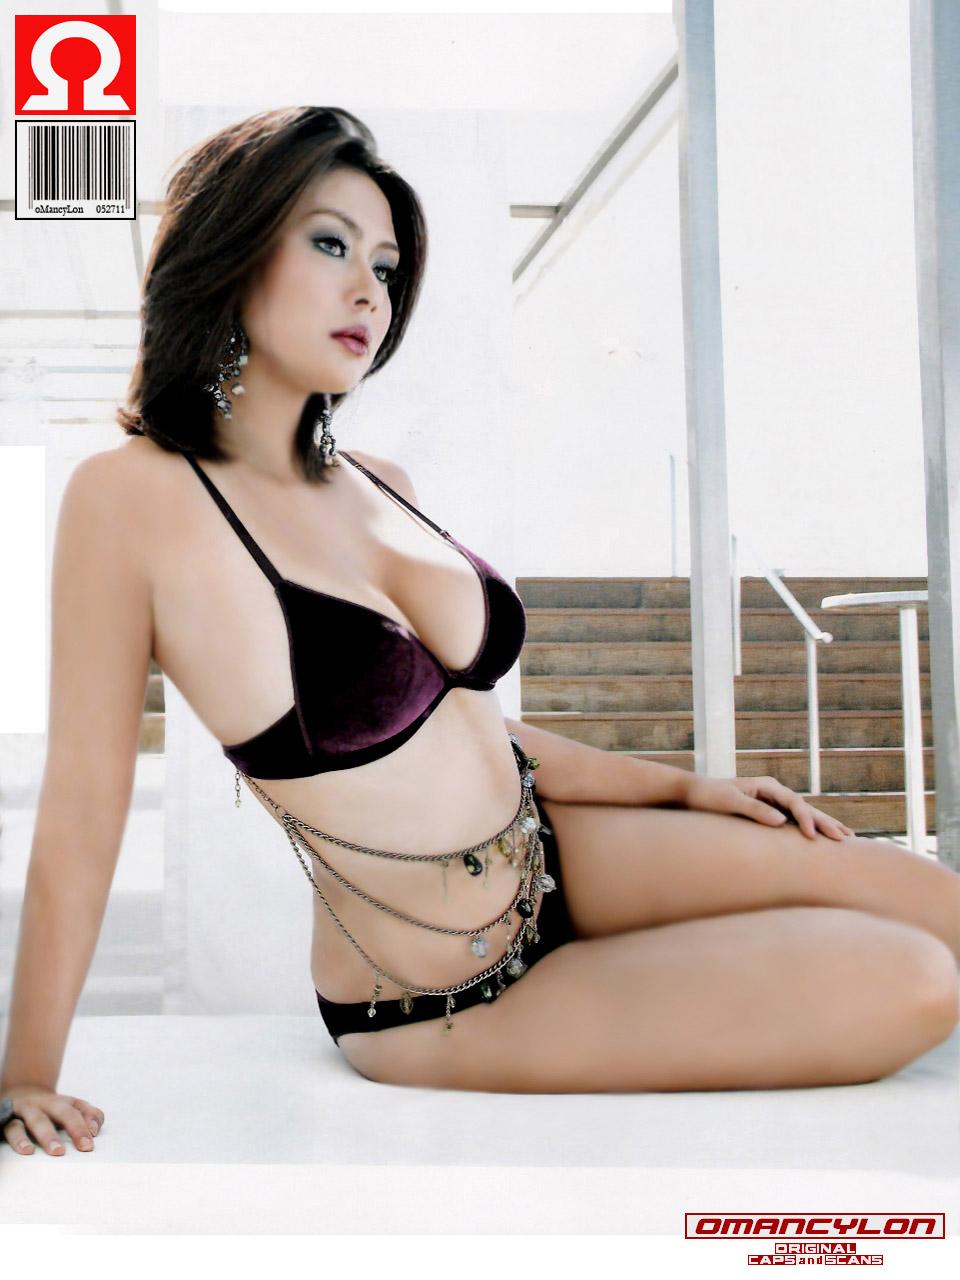 Valuable Iwa motto nude pics